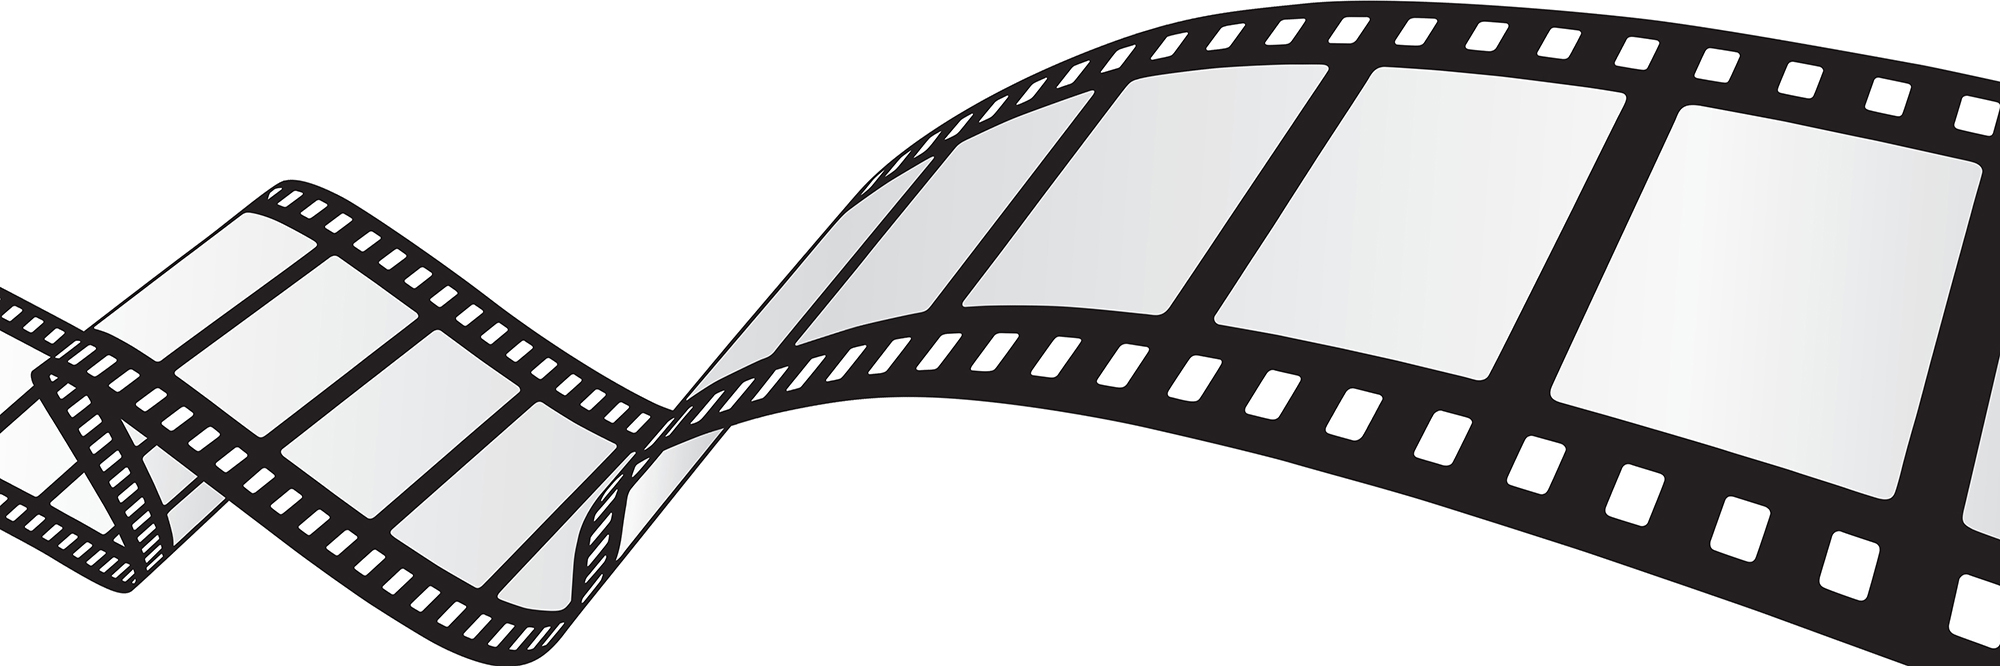 Kurzfilm-Kino: 2017 Kurzfilme Klasse 9c+d